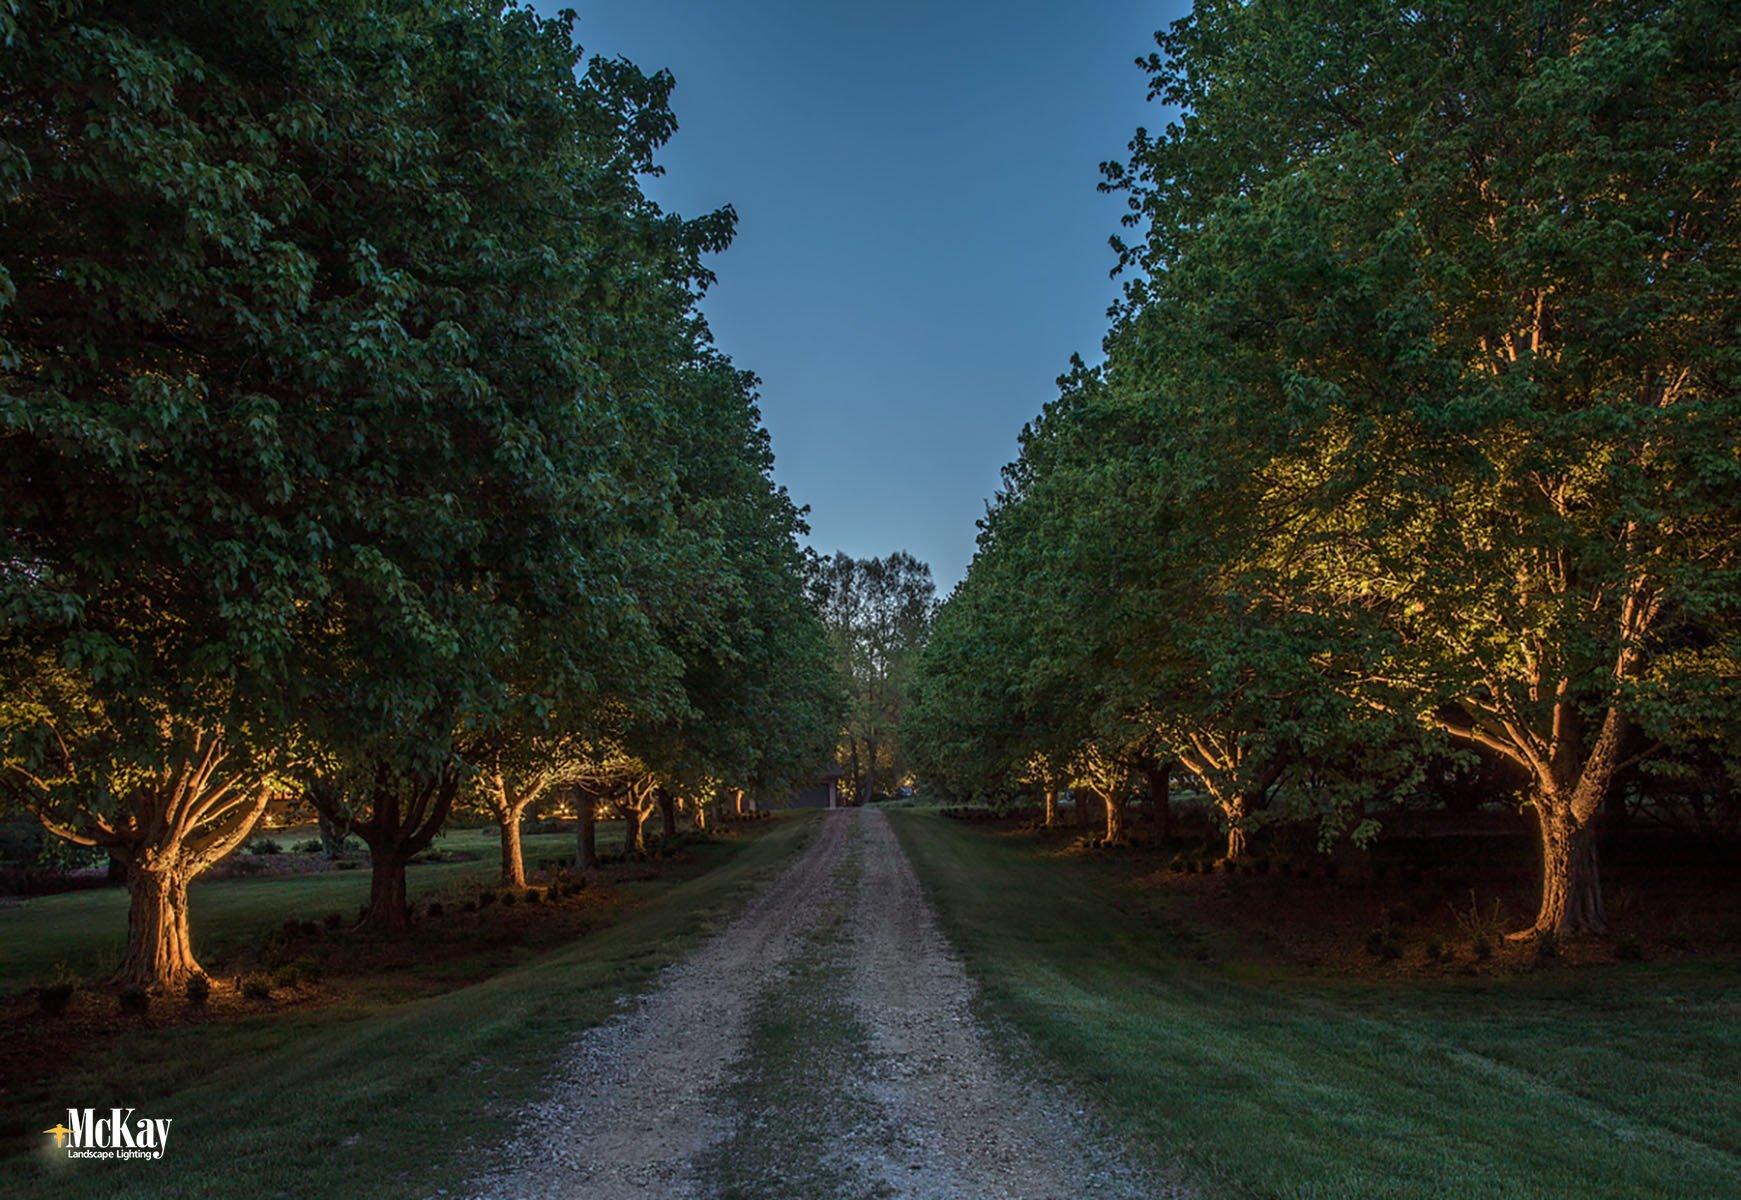 Driveway Lighting Ashland Nebraska McKay Landscape Lighting DS 01-2